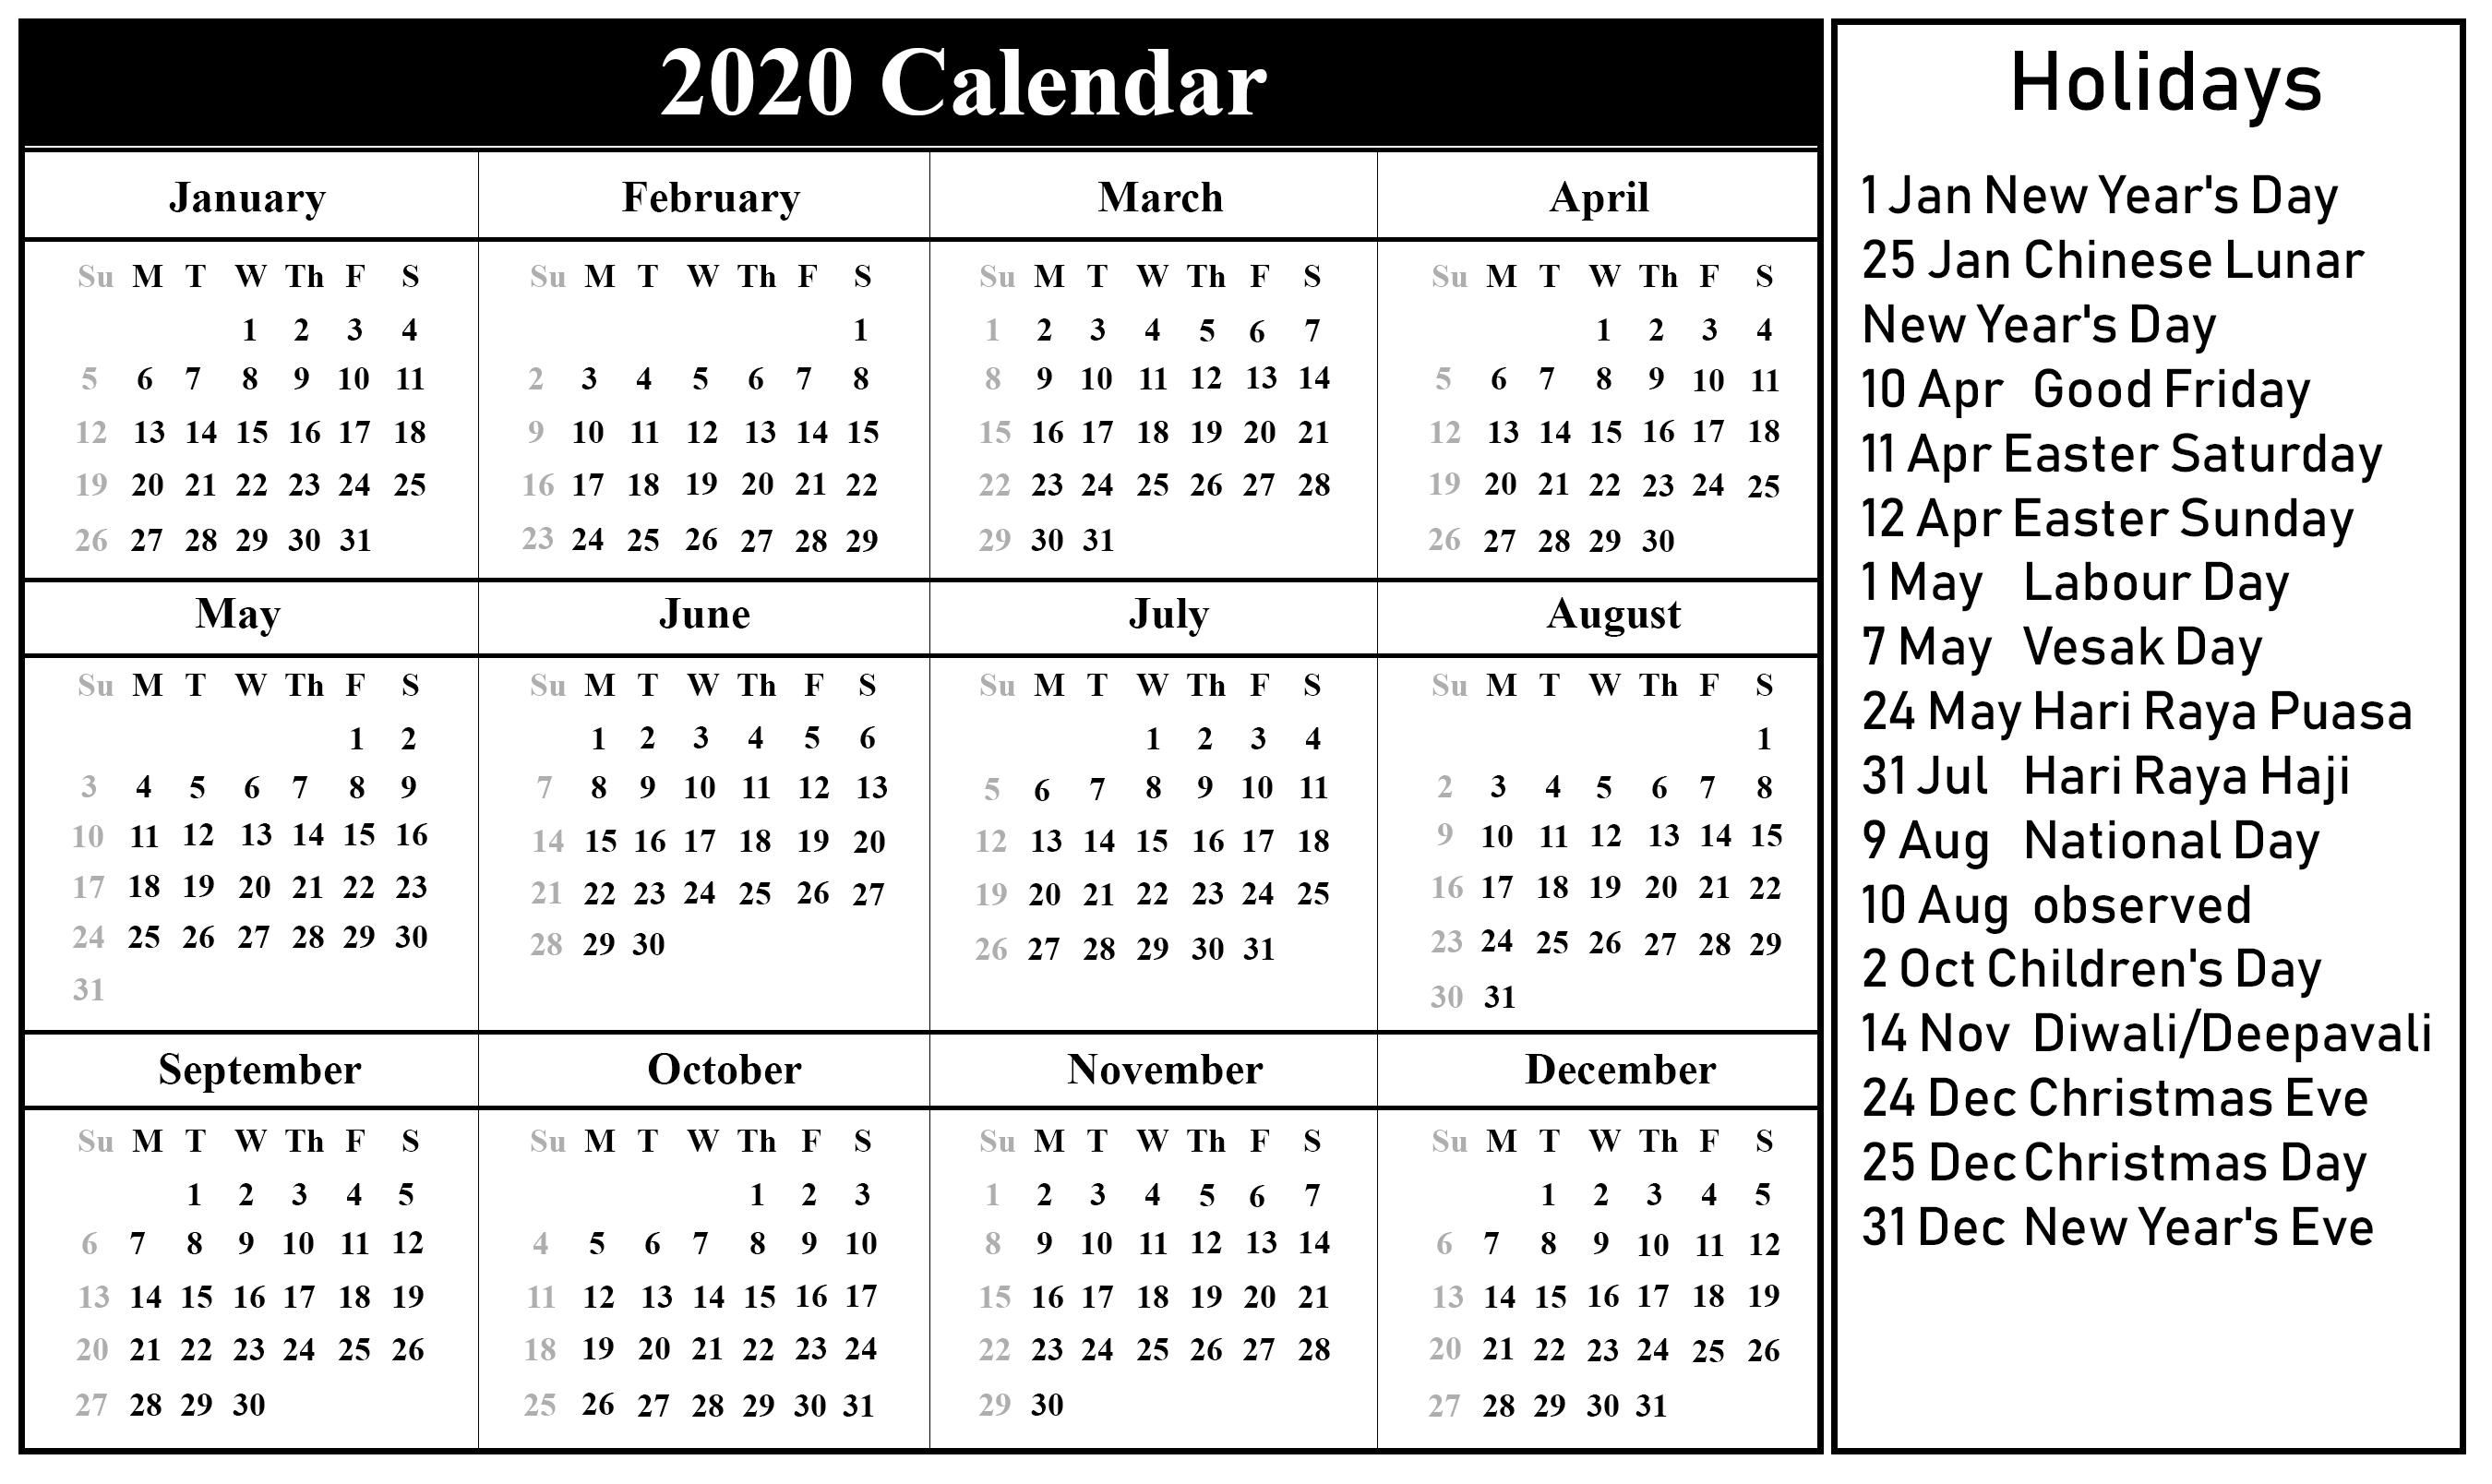 Printable 2020 Calendar With Holidays | Monthly Calendar in Year At A Glance Calendar 2020 With Holiday Free Printable